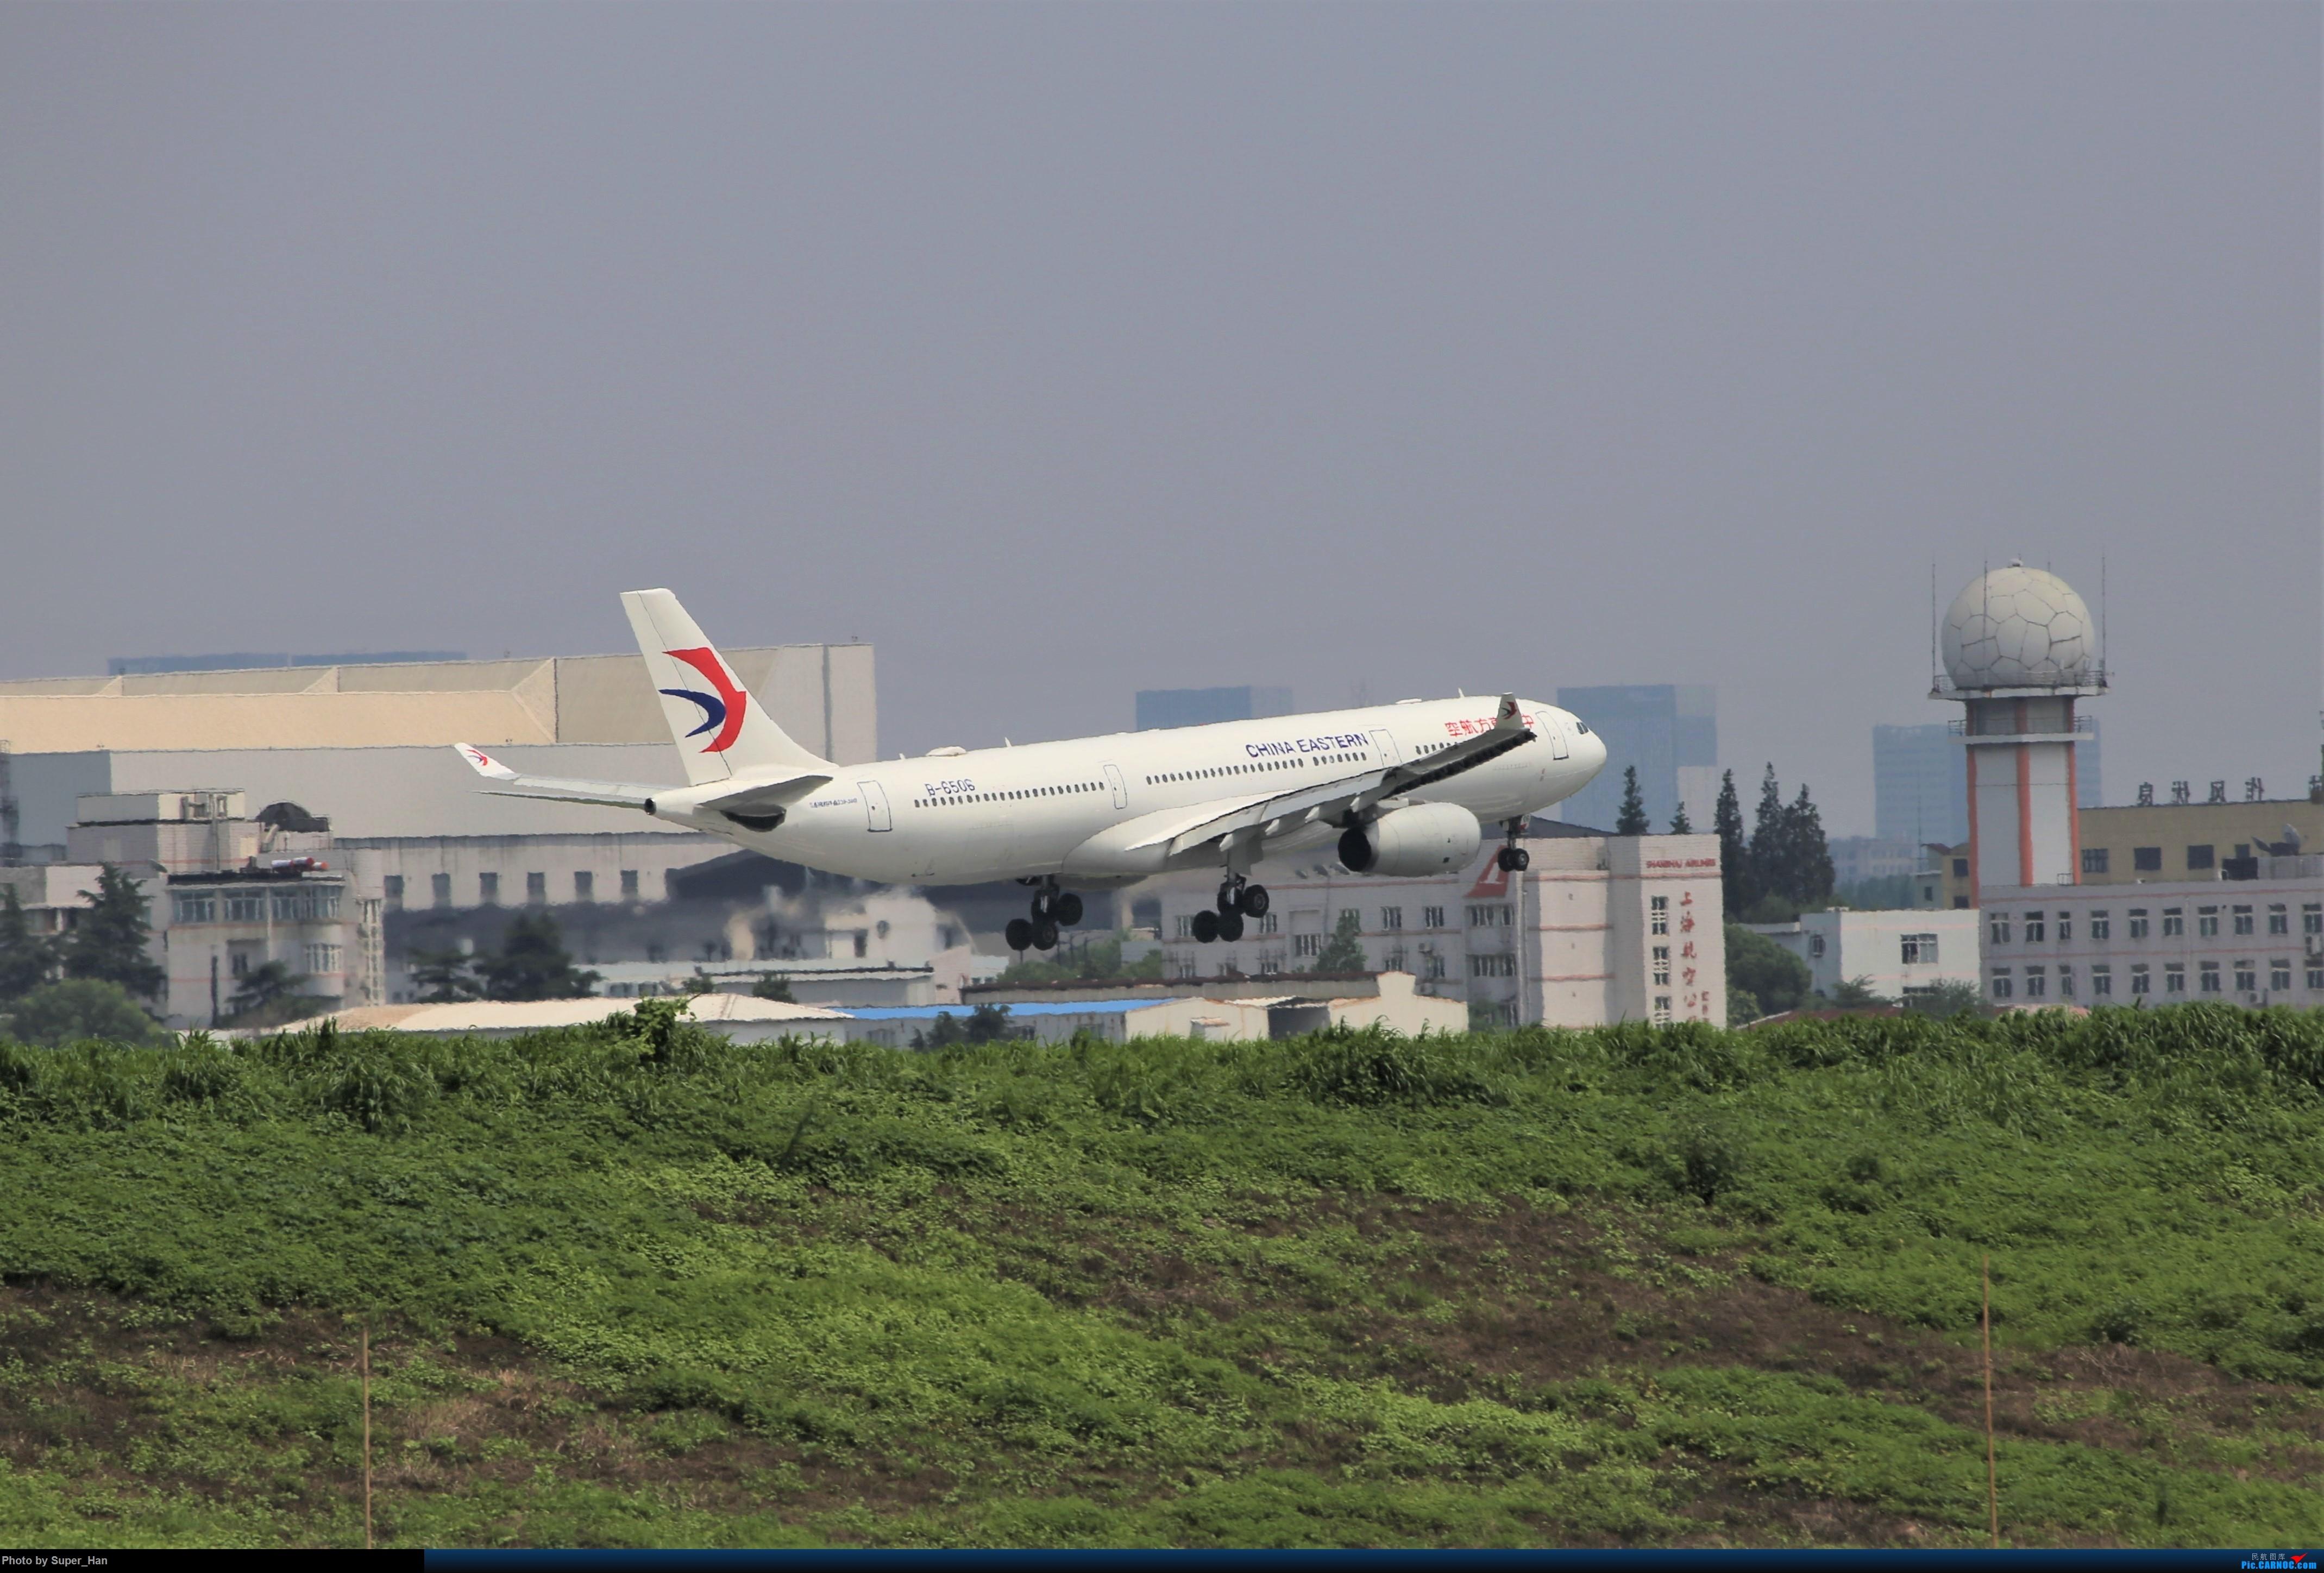 Re:[原创]0715去虹桥说走就走【最多的330篇】 AIRBUS A330-300 B-6506 中国上海虹桥国际机场